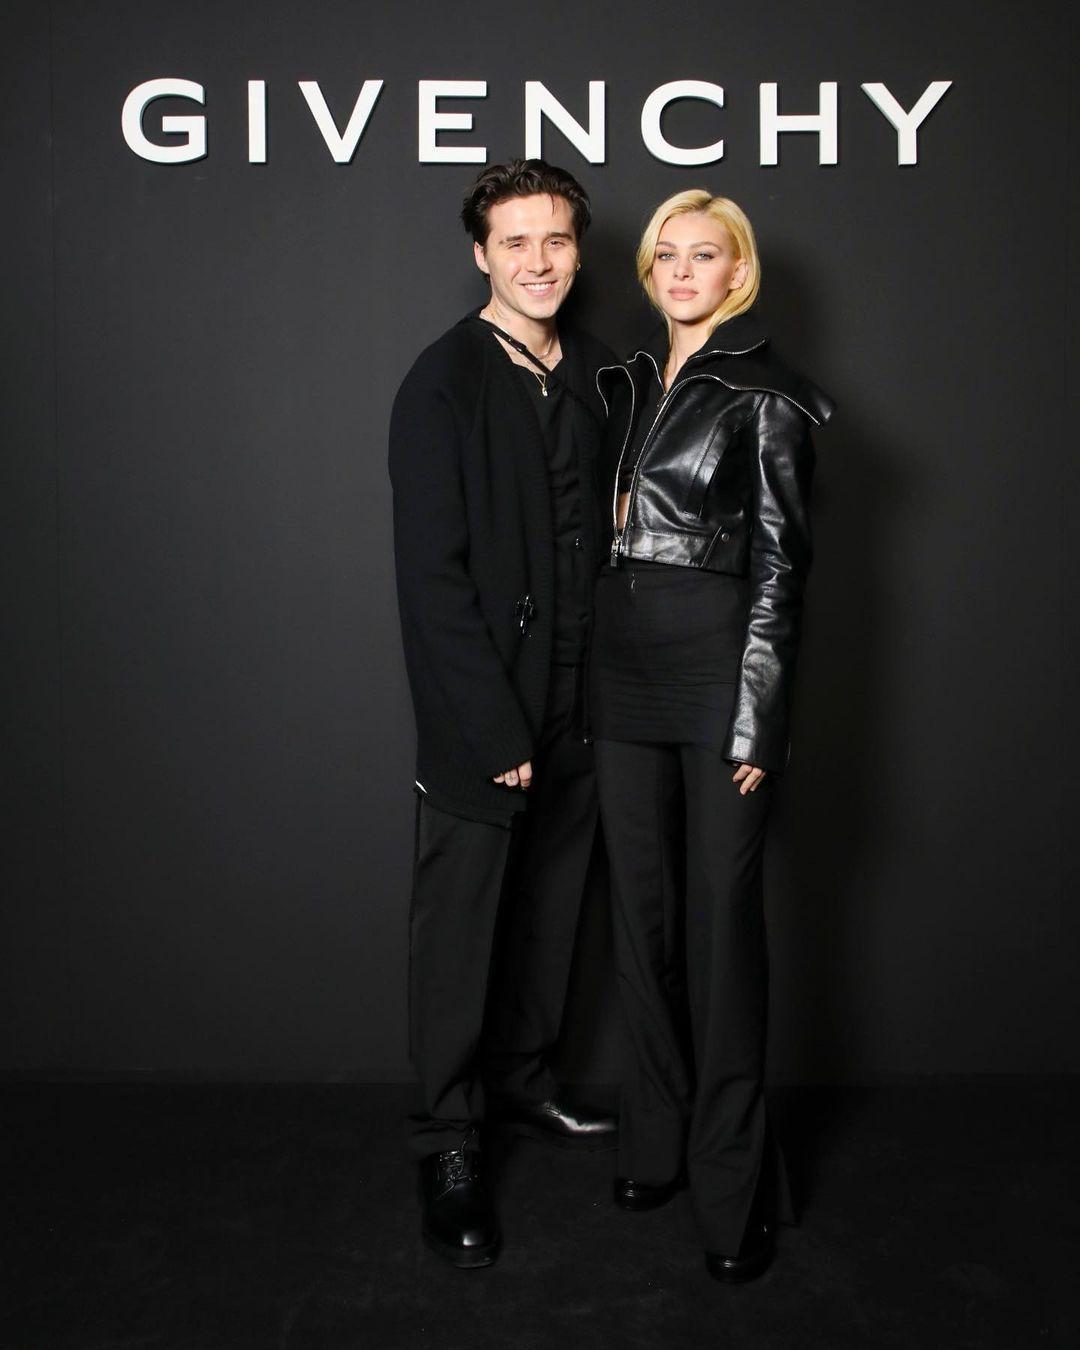 Brooklyn Beckham dan Nicola Peltz di Fashion Show Givenchy Spring/Summer 2022